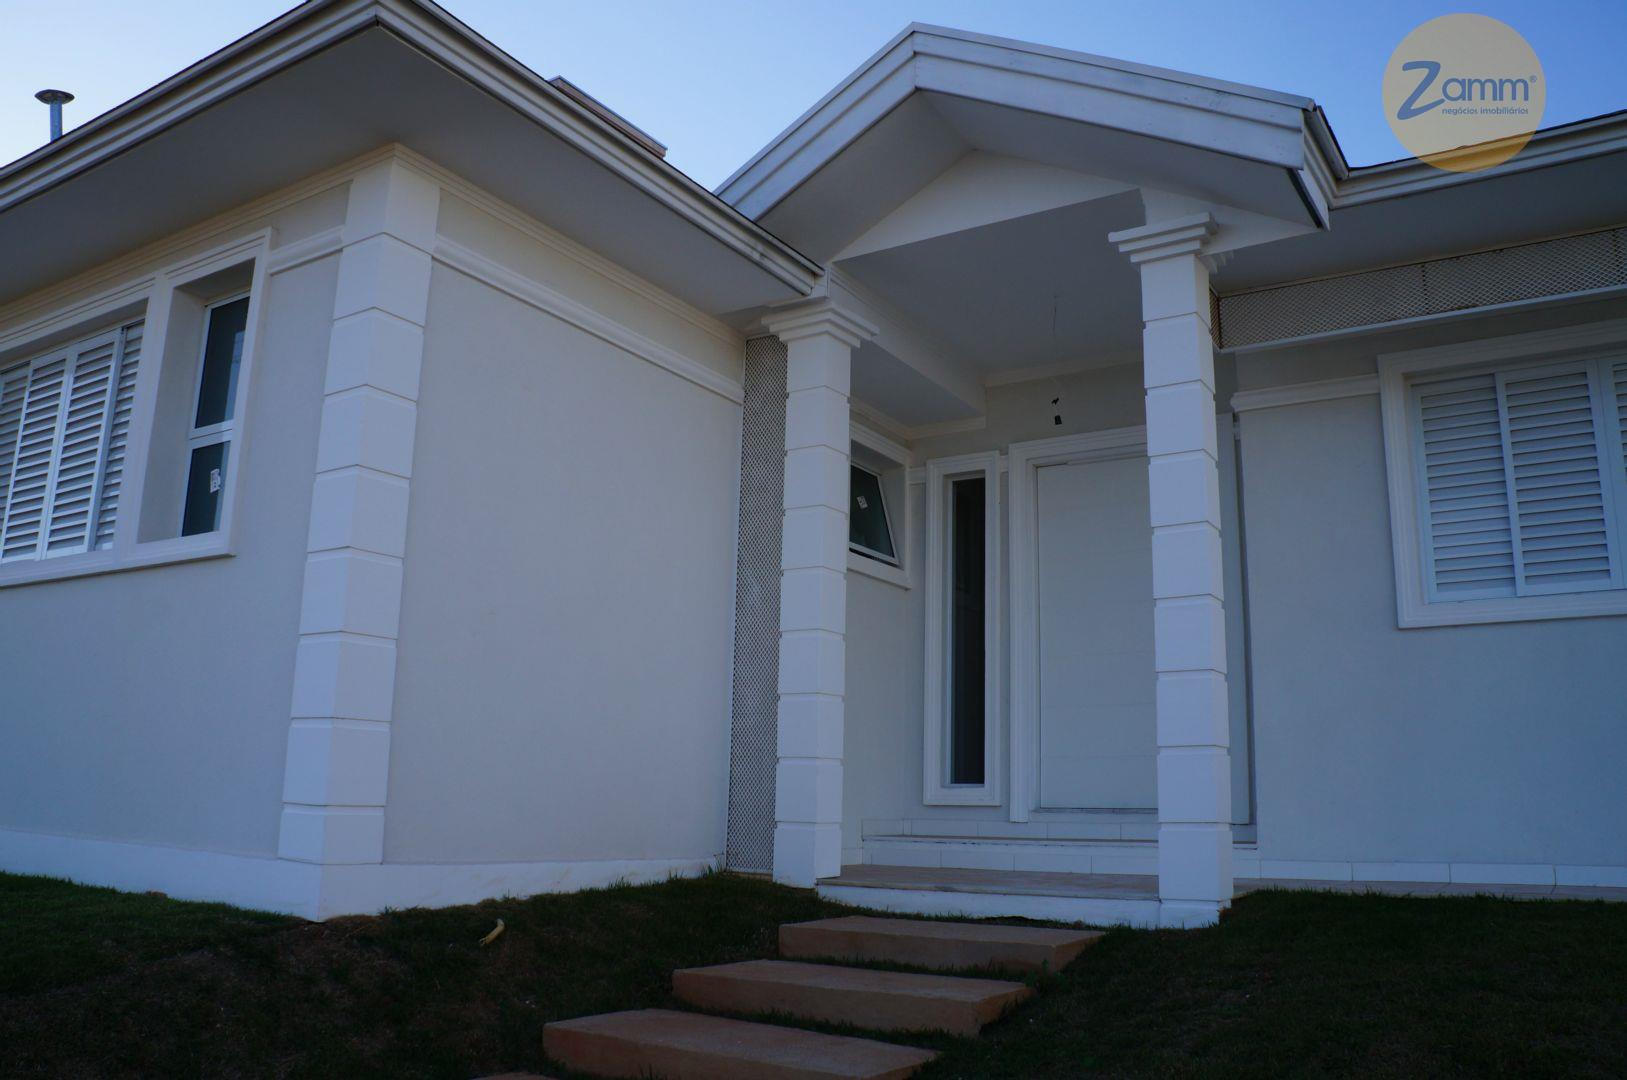 Casa de 3 dormitórios em Condomínio Le Village, Valinhos - SP